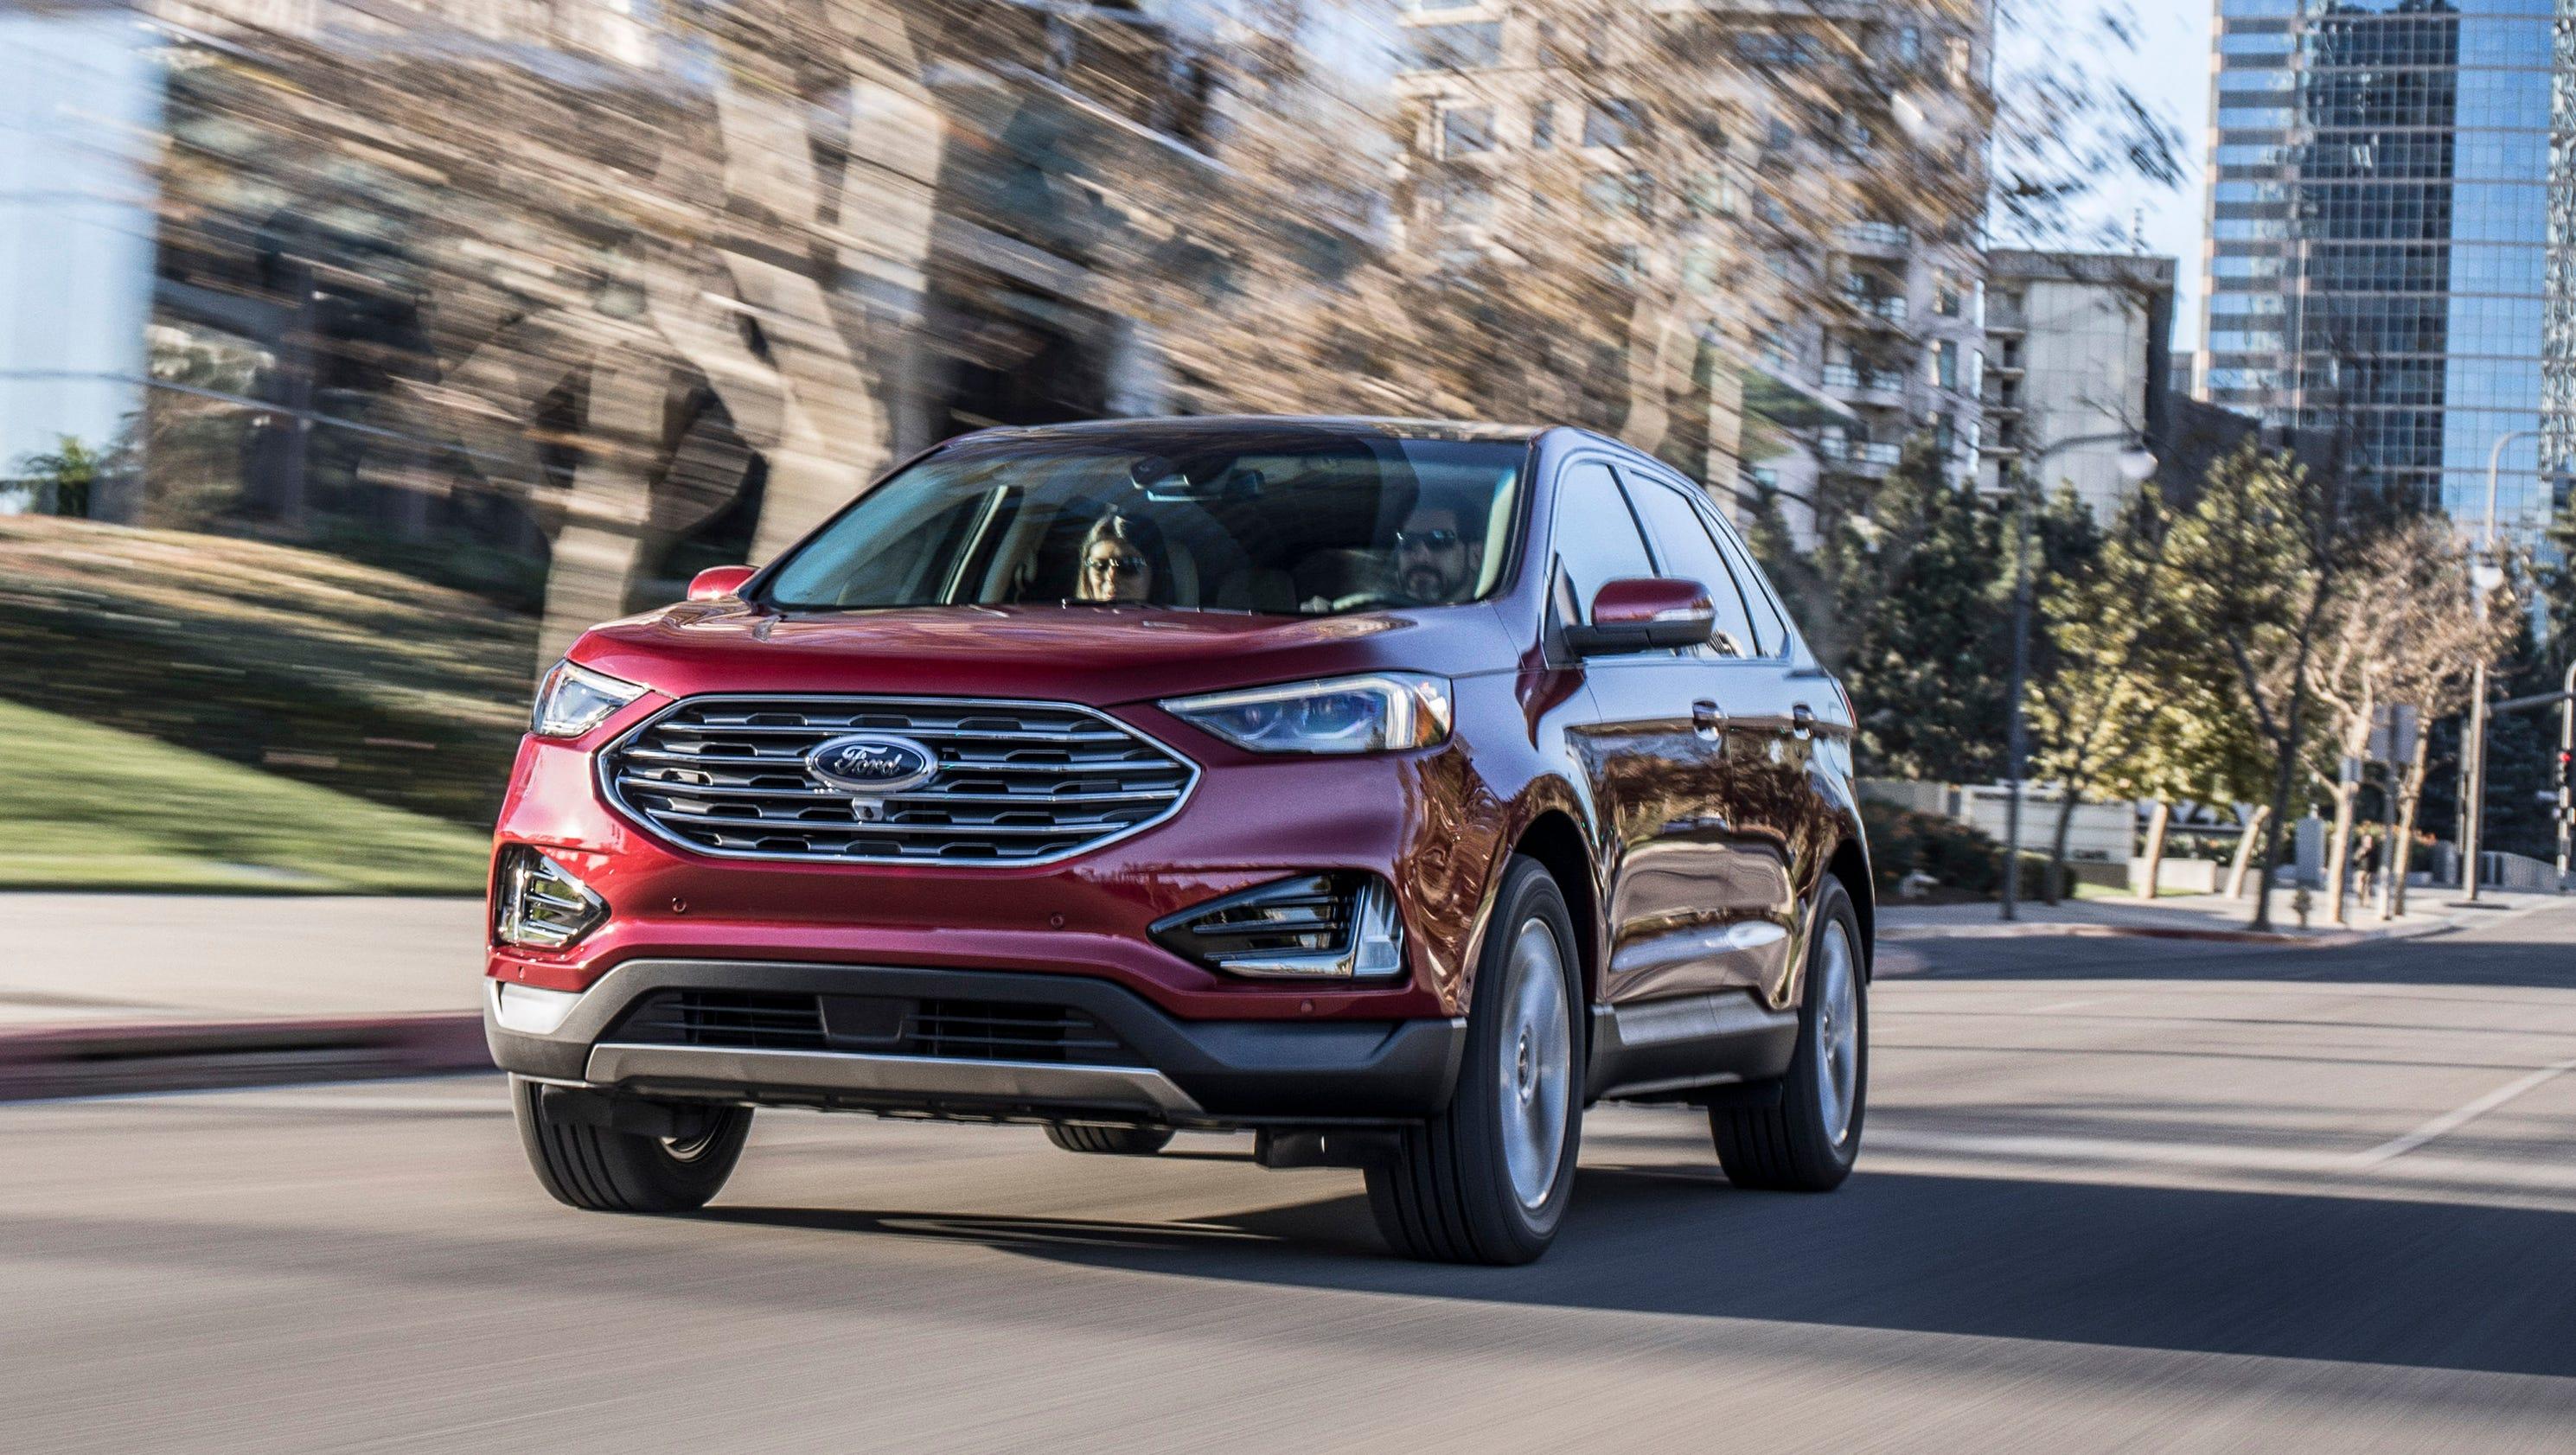 2018 Detroit Auto Show: 2019 Ford Edge revealed